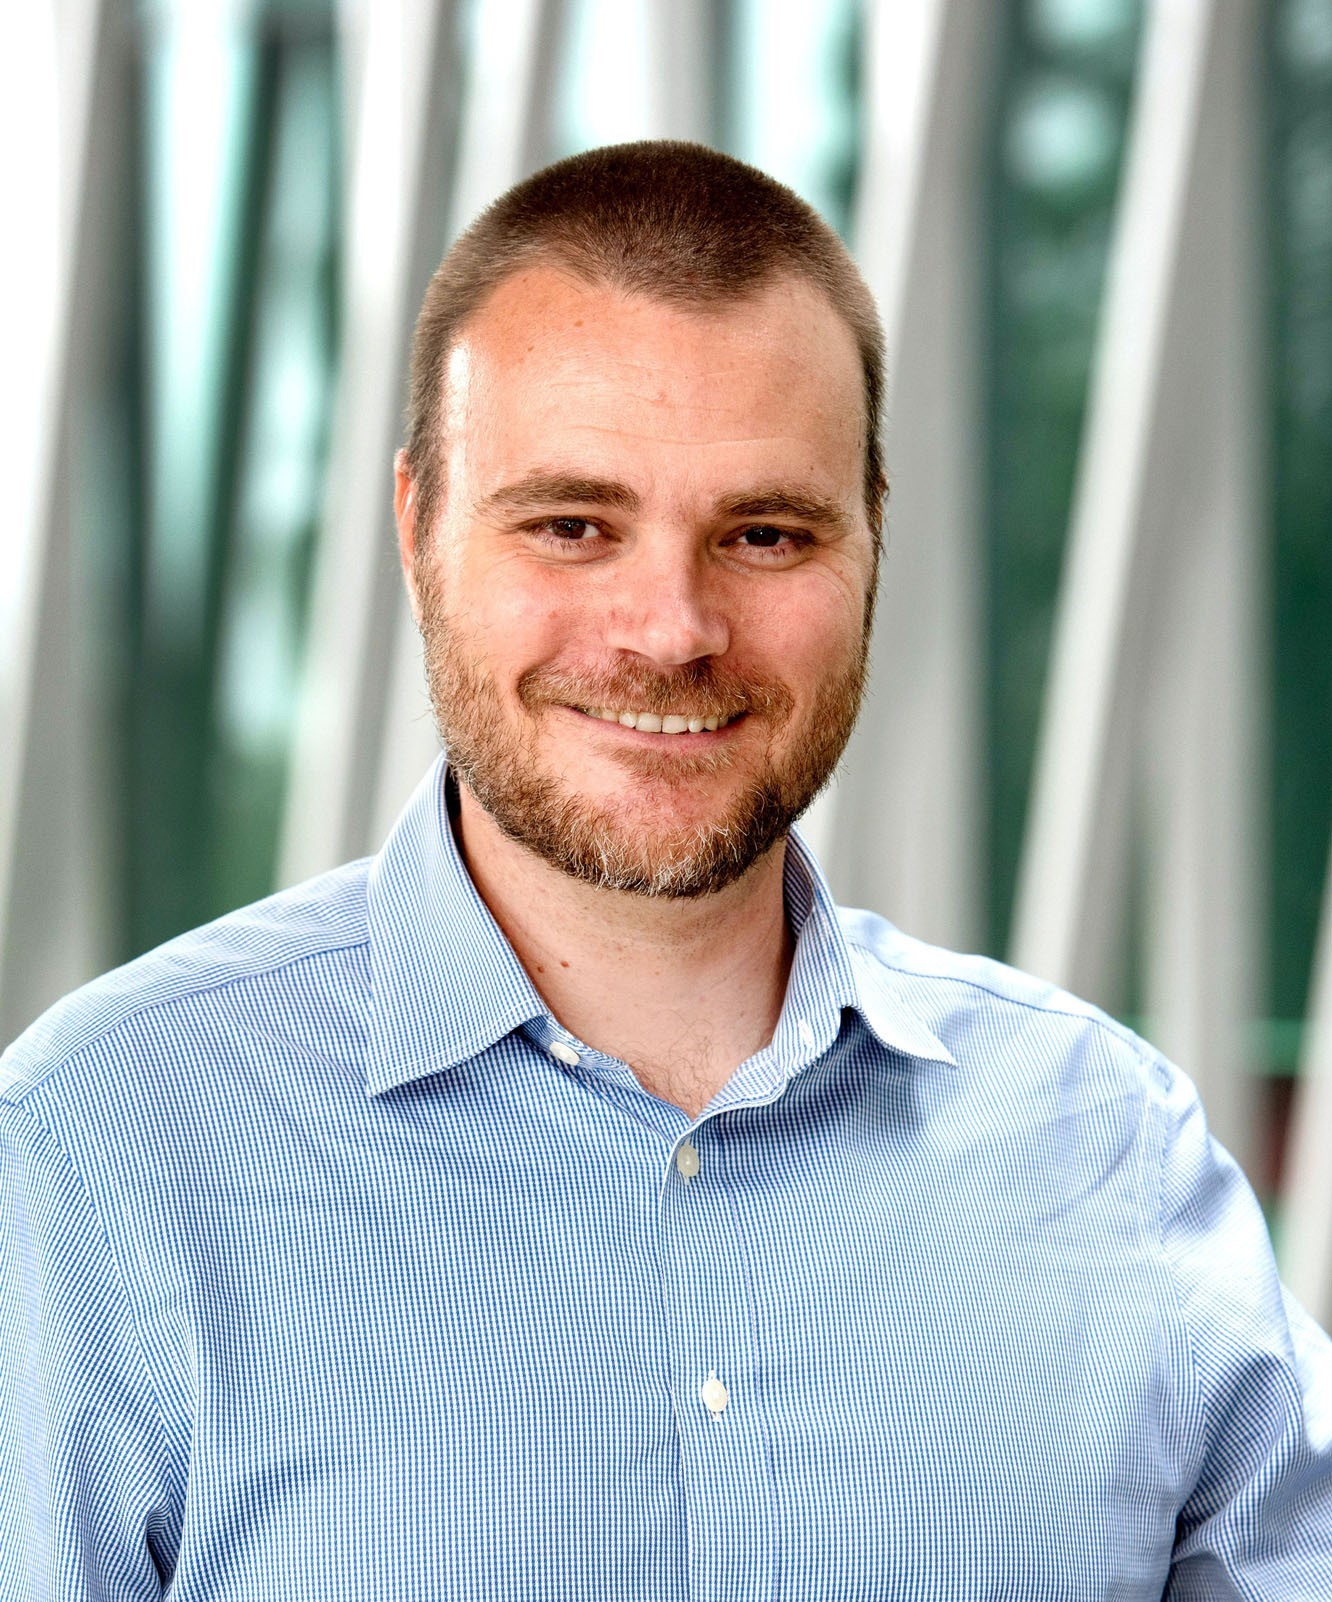 Managing Director - Innovation of METS Ignited